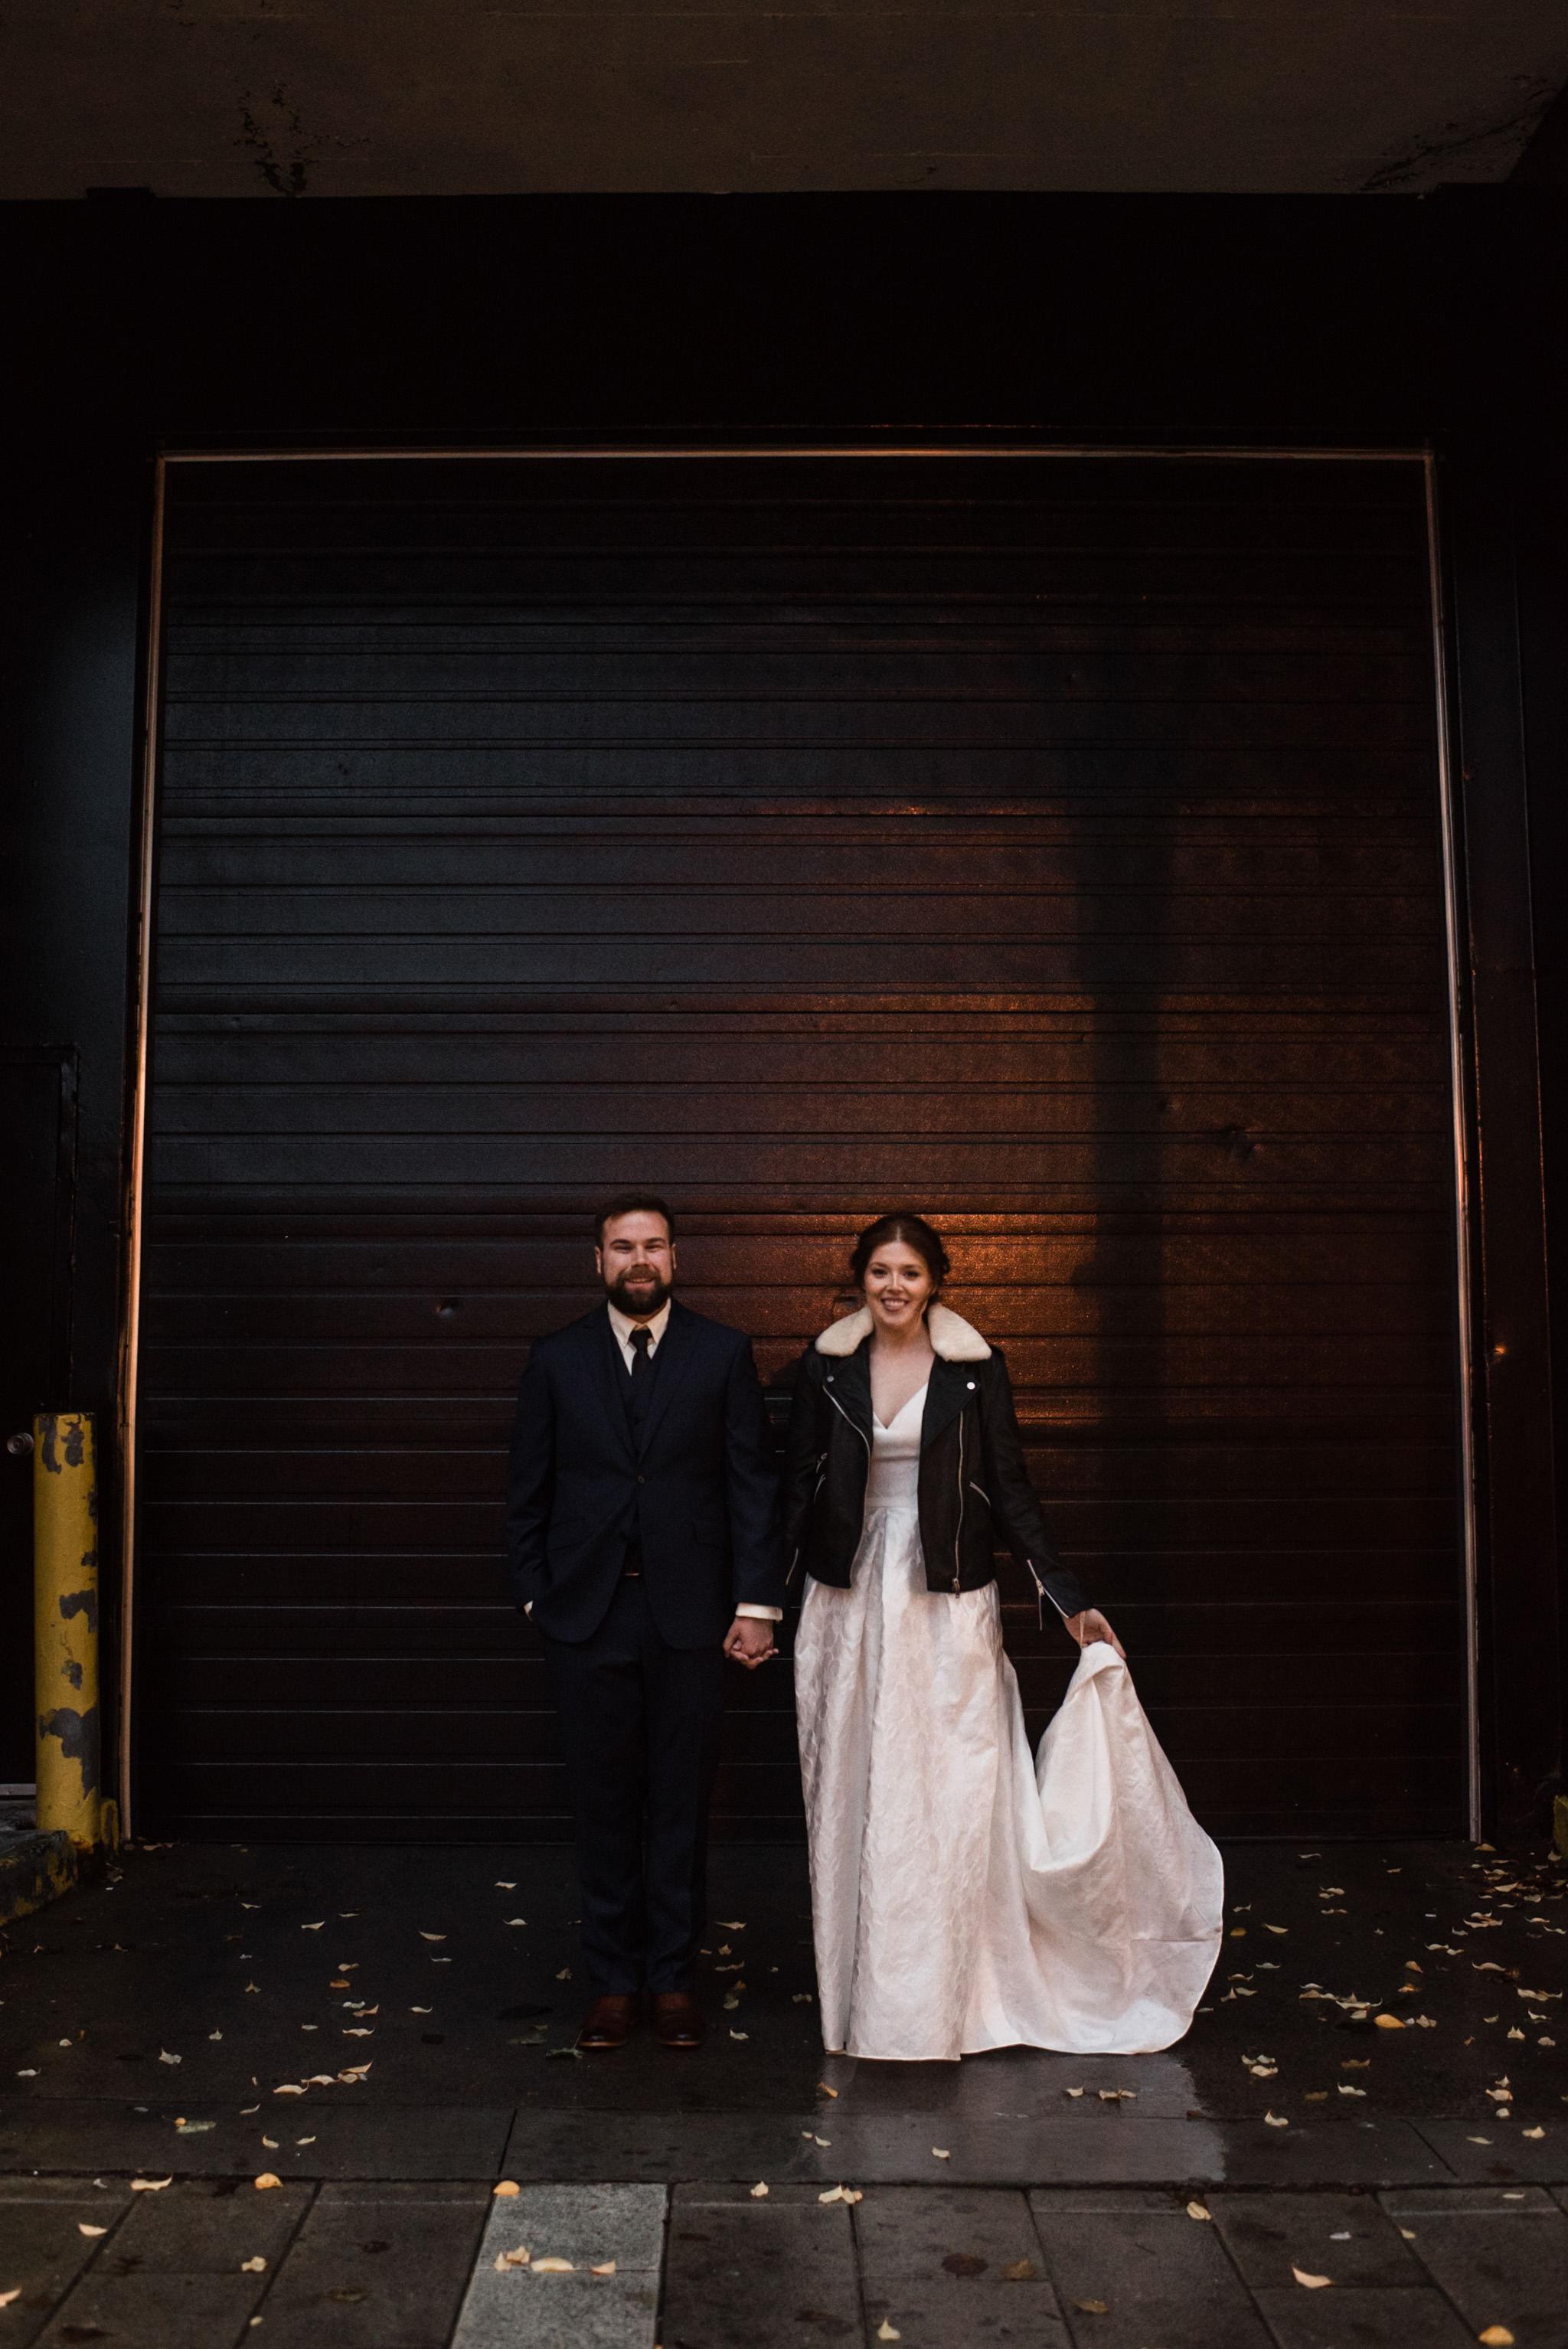 123-wedding-couple-portraits-at-night-toronto-intimate-wedding-photographer.jpg